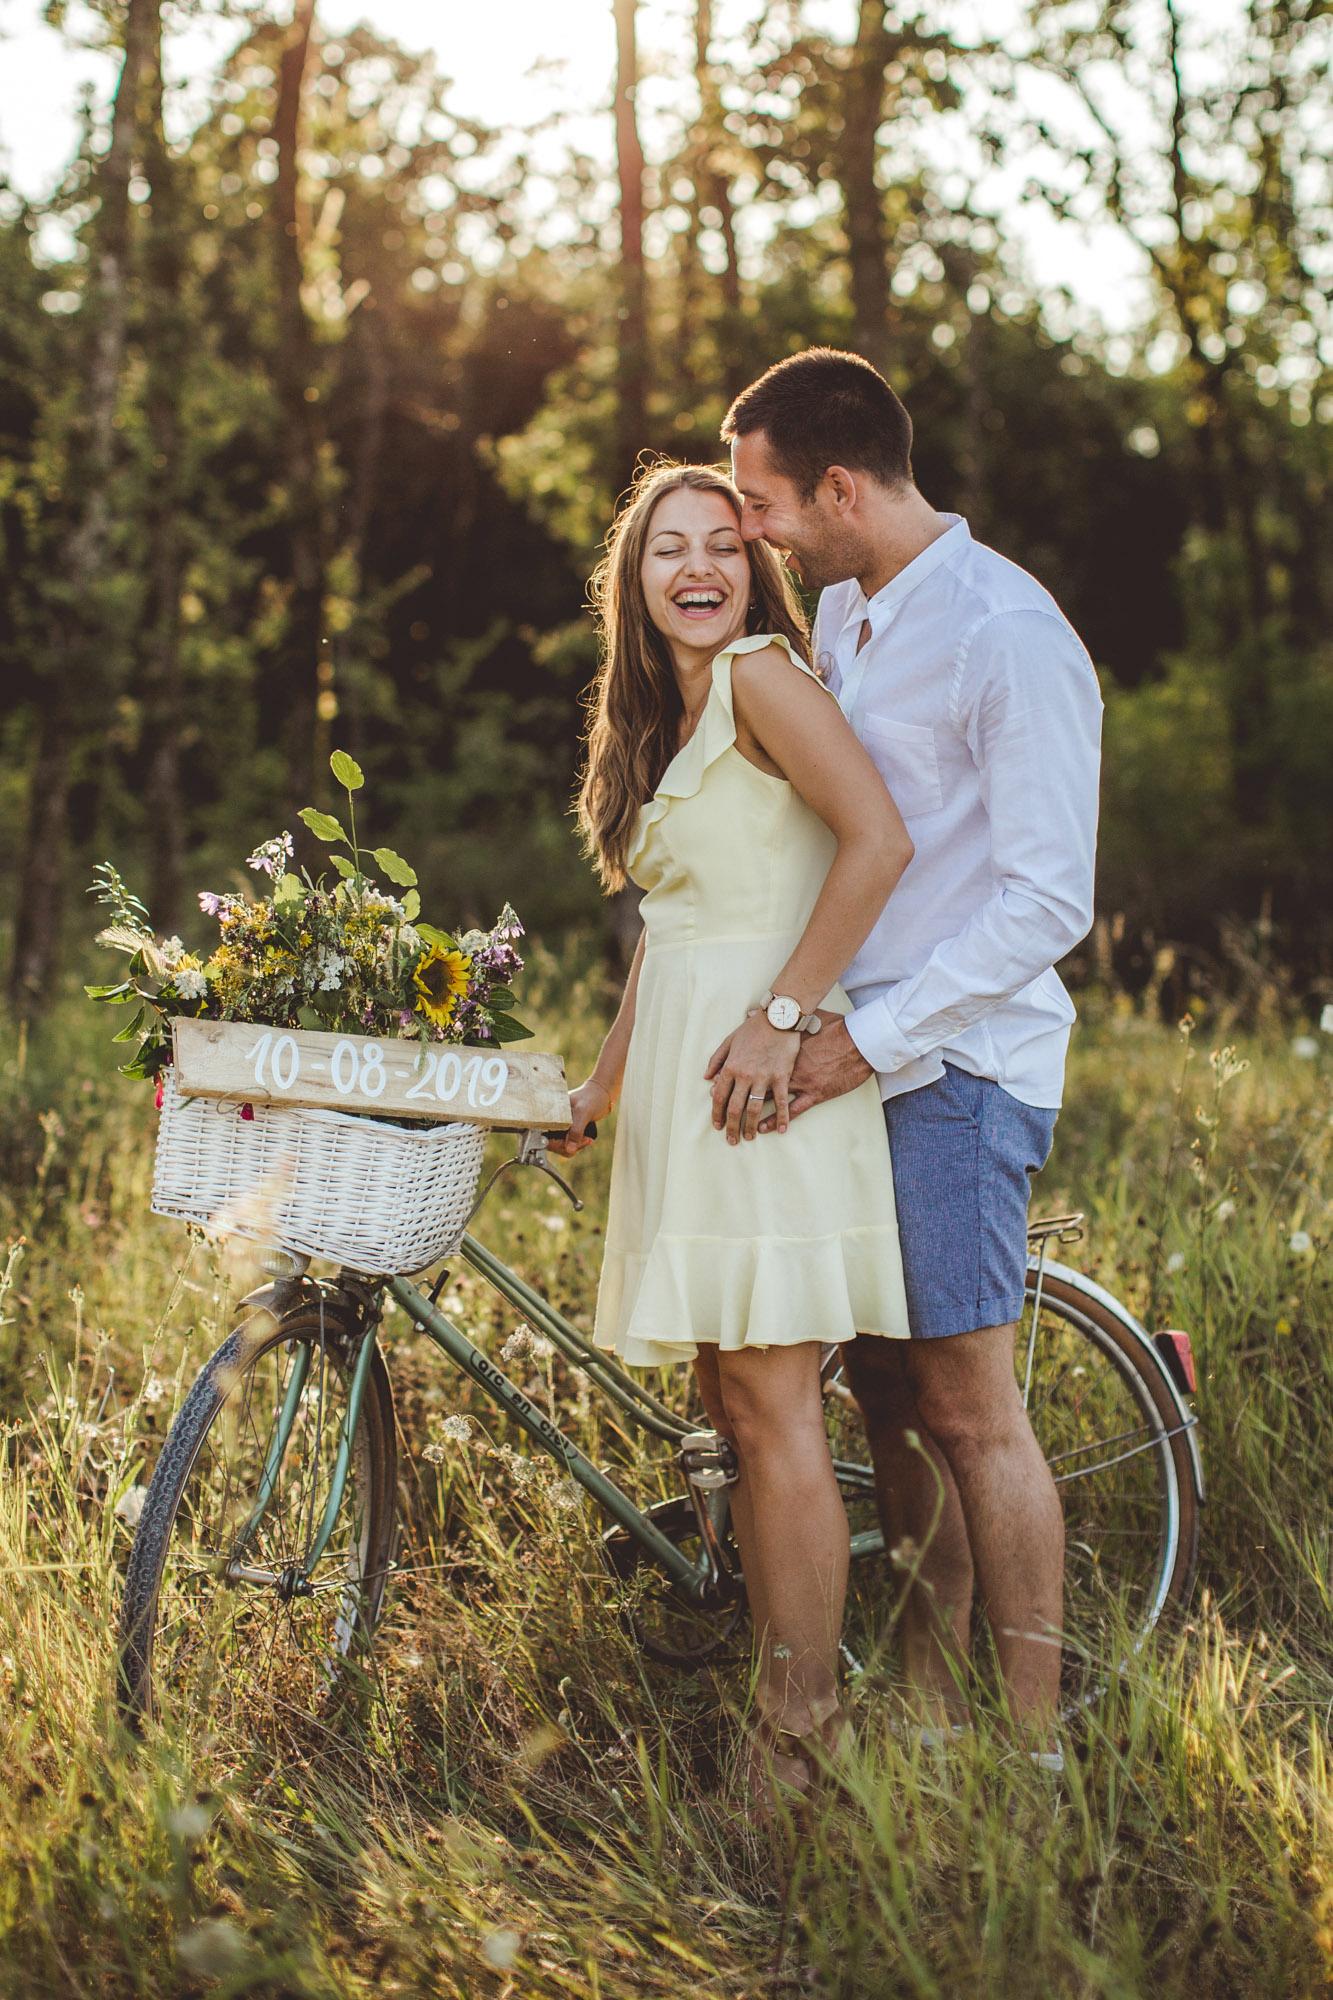 futurs maries pendant seance save the date a cognac dans vignes campagne foret a velo bicyclette